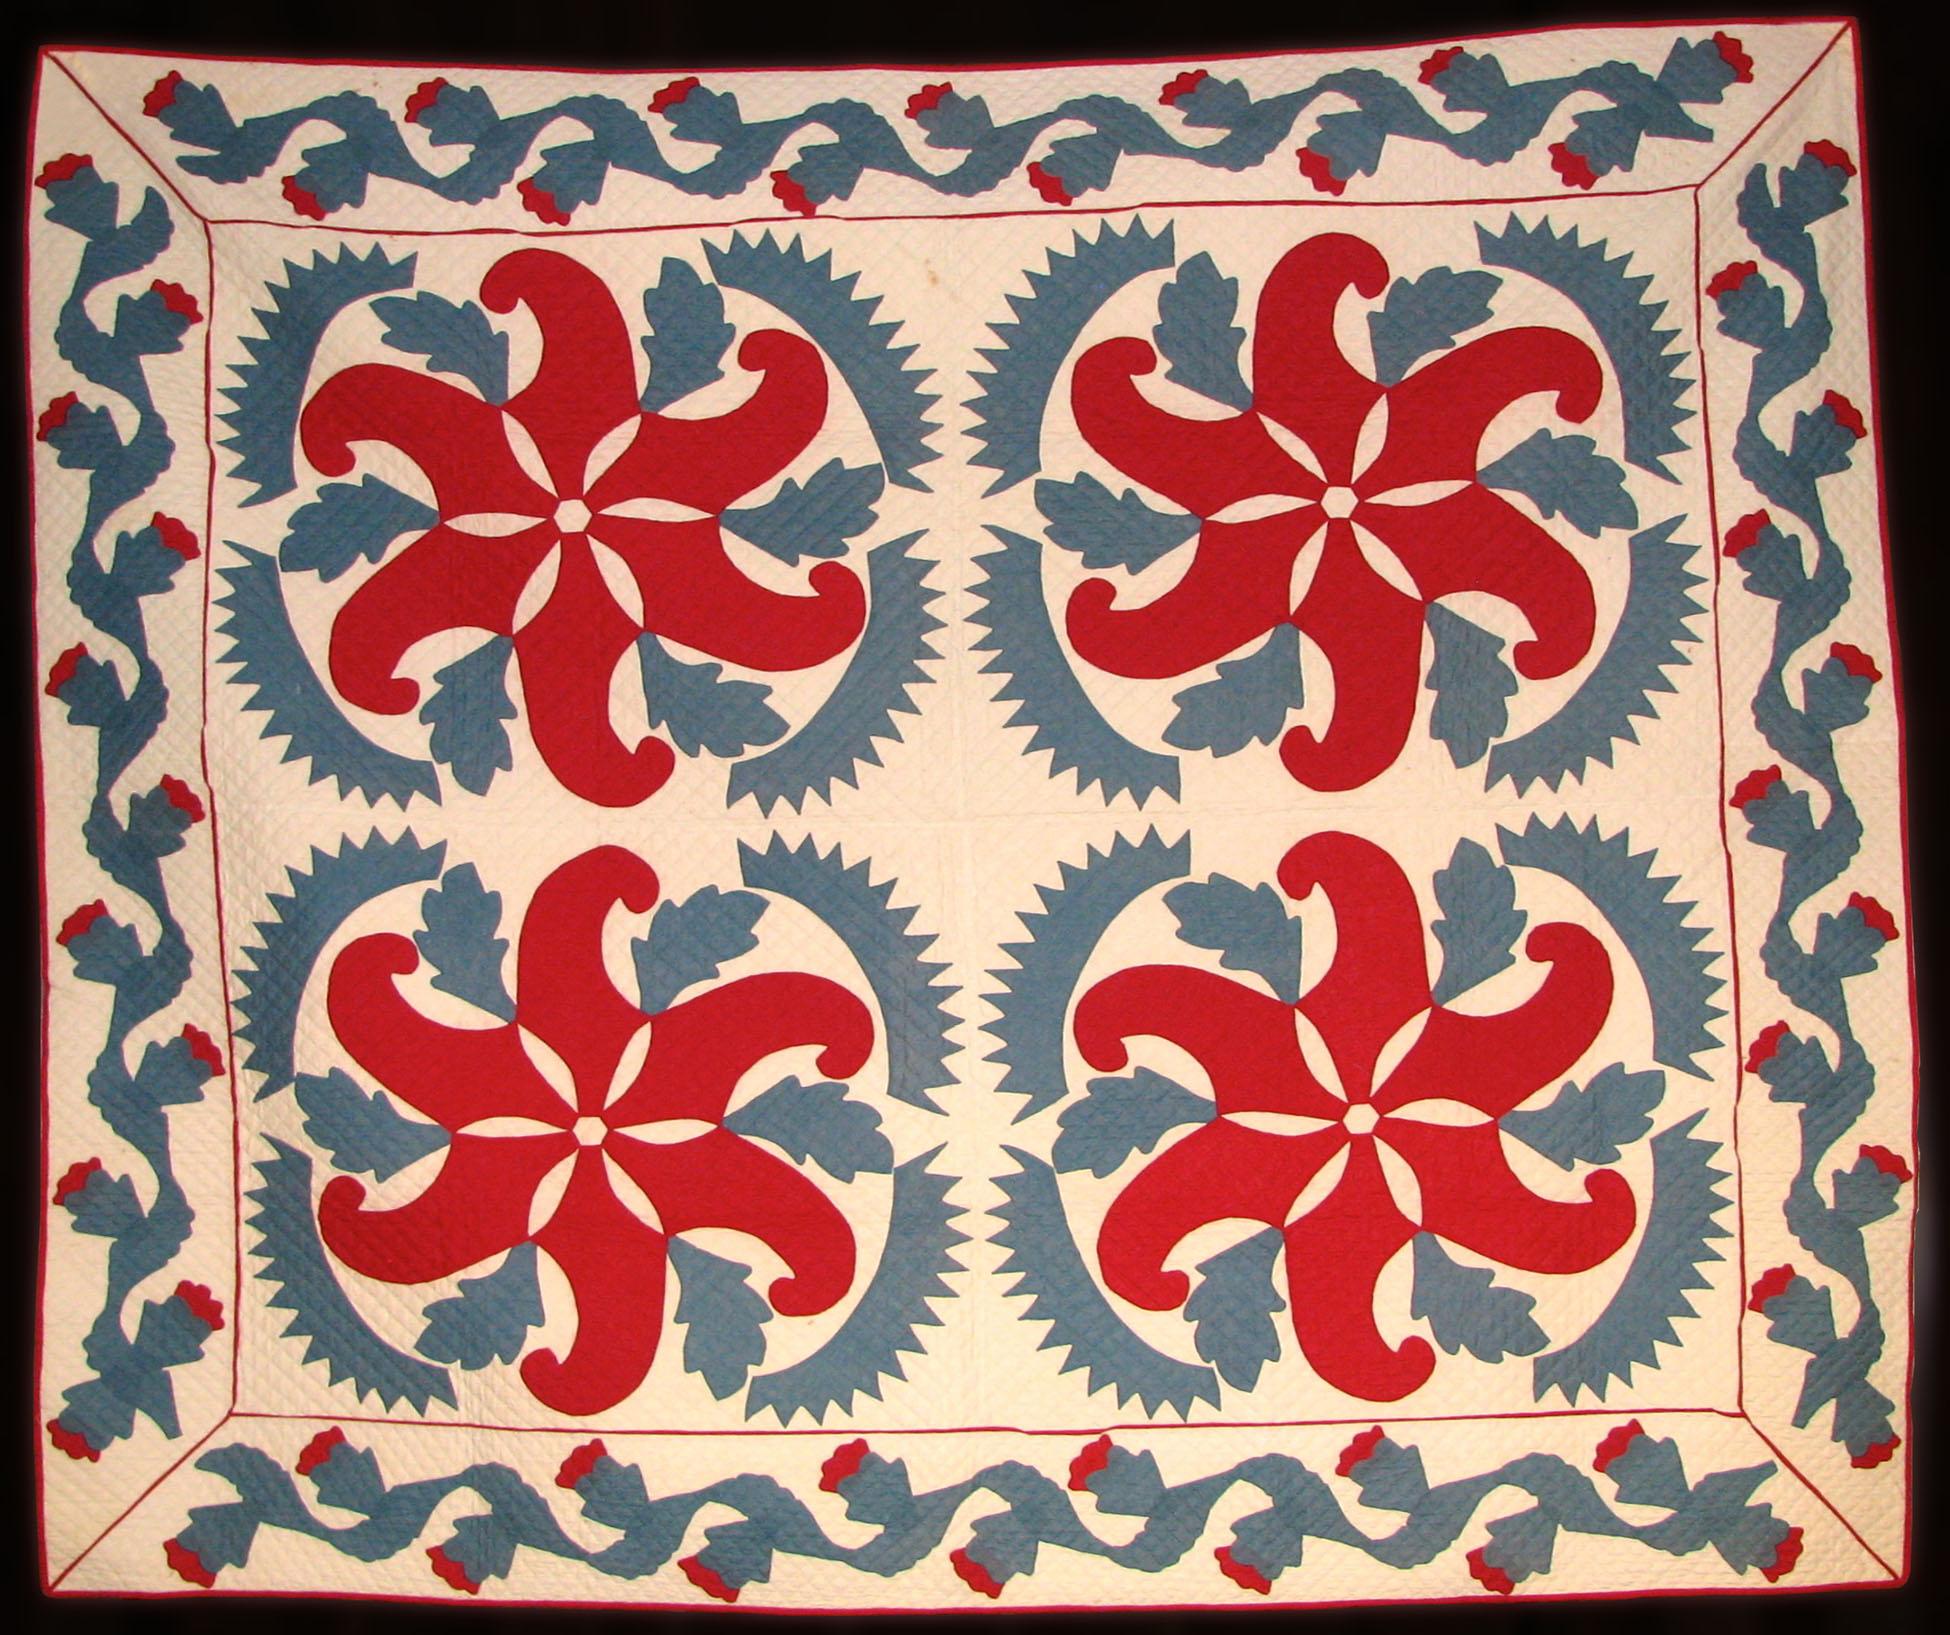 Exhibit to display inherited Mennonite and Amish quilts | Goshen ... : mennonite quilts sale - Adamdwight.com